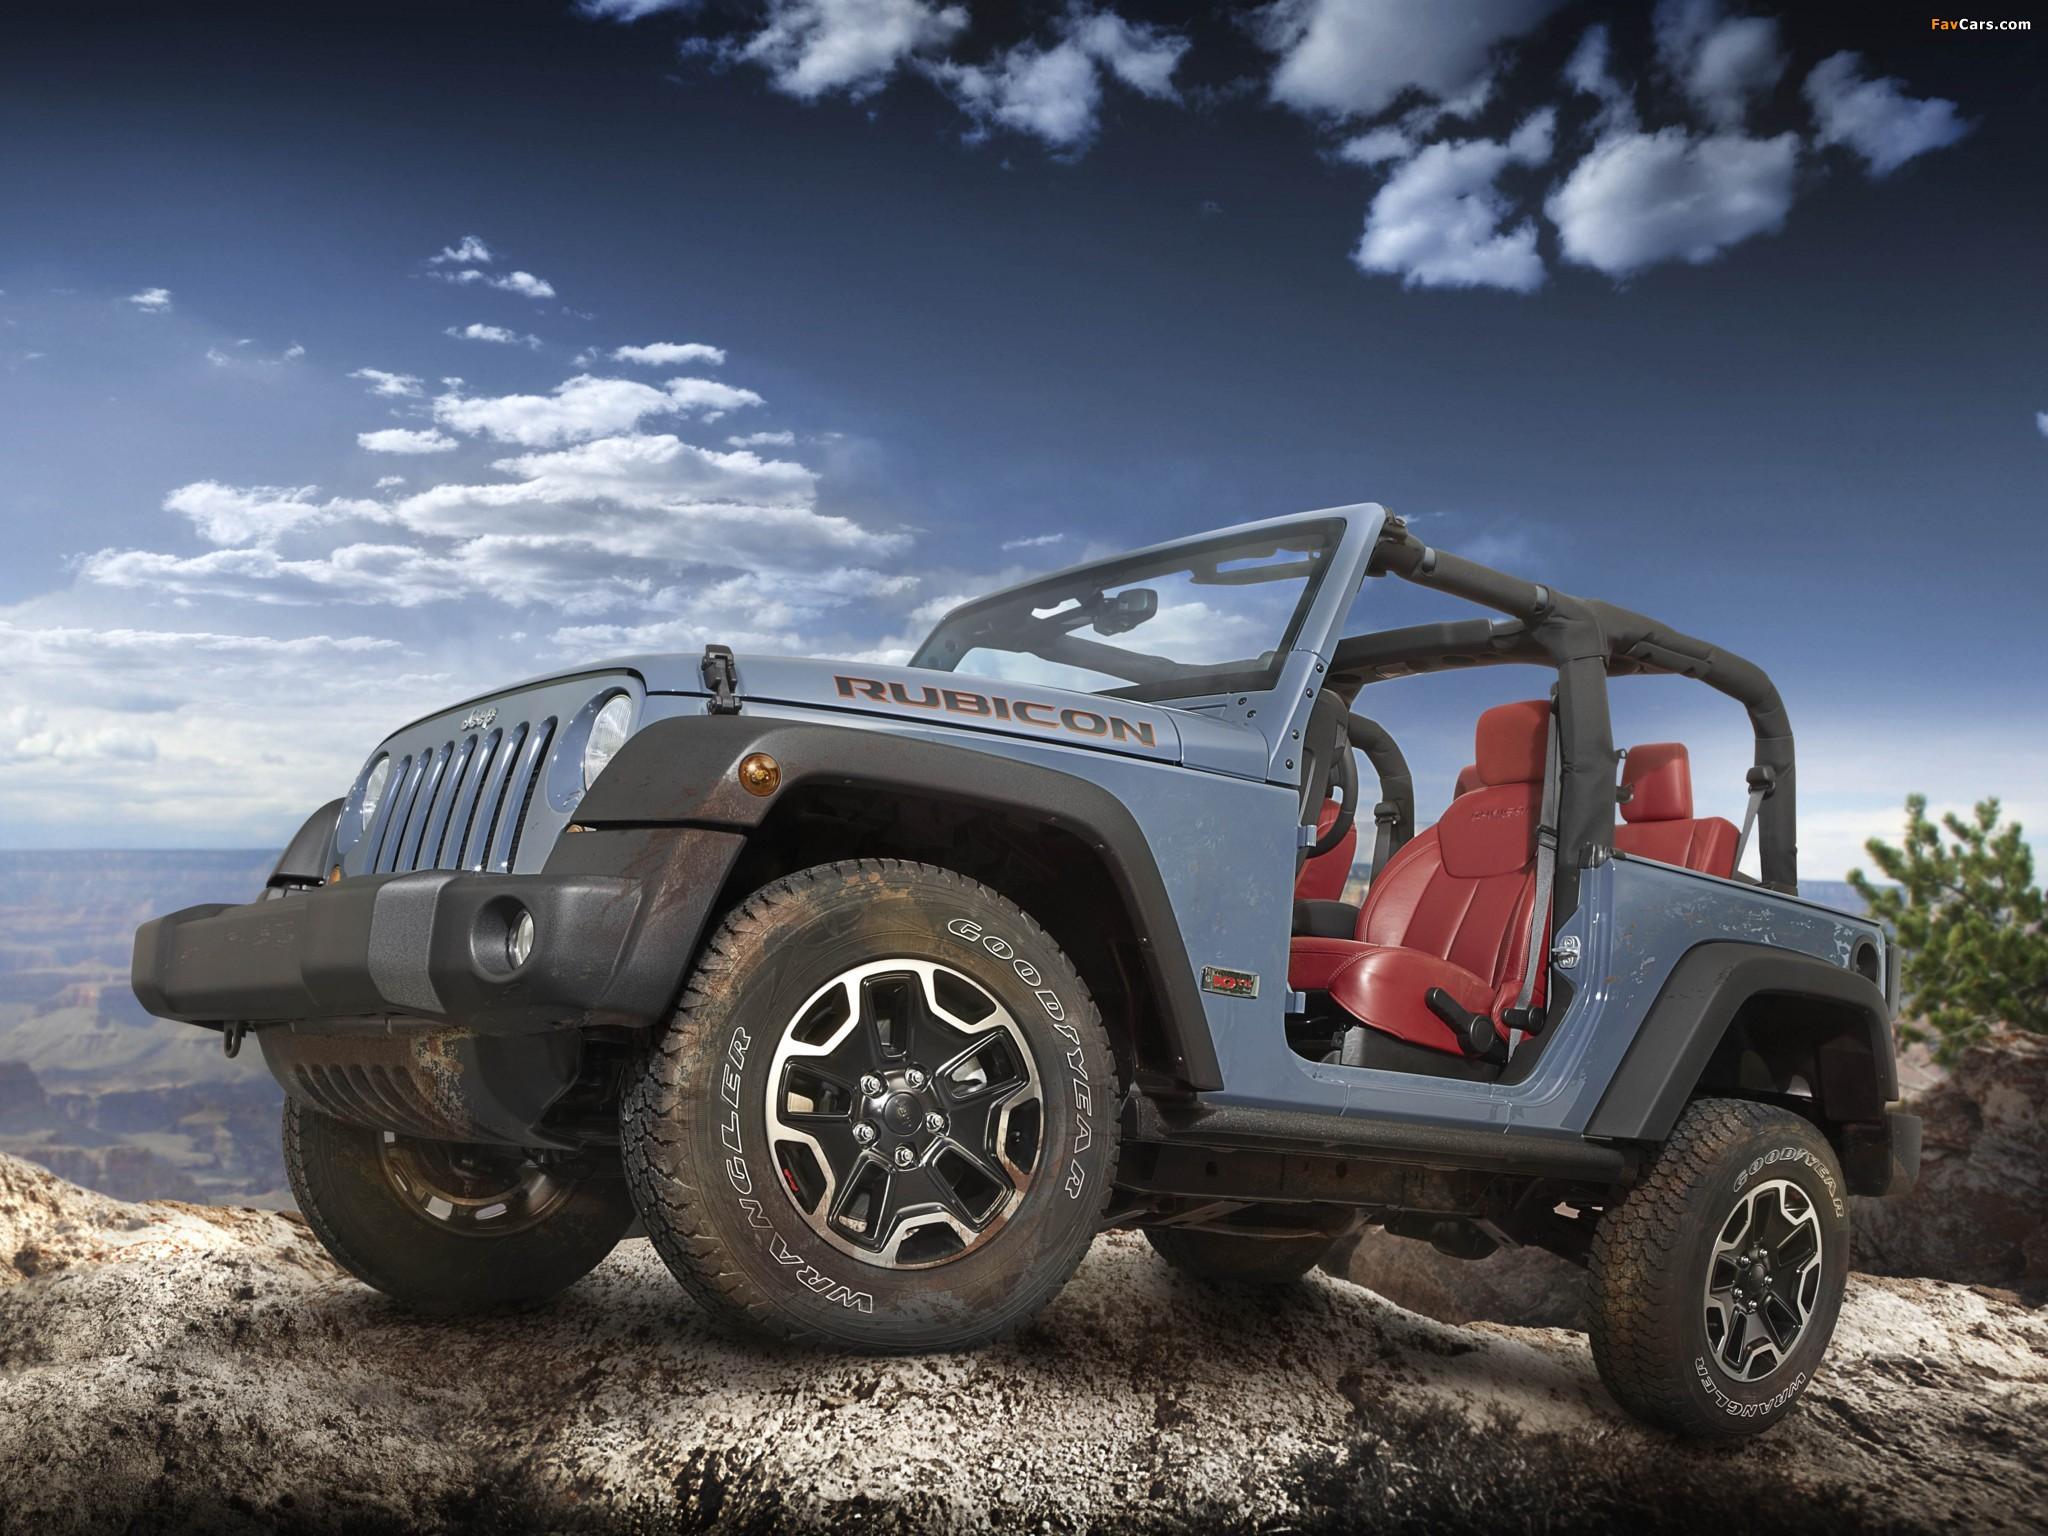 Jeep Wrangler Rubicon 10th Anniversary EU-spec (JK) 2013 photos (2048 x 1536)